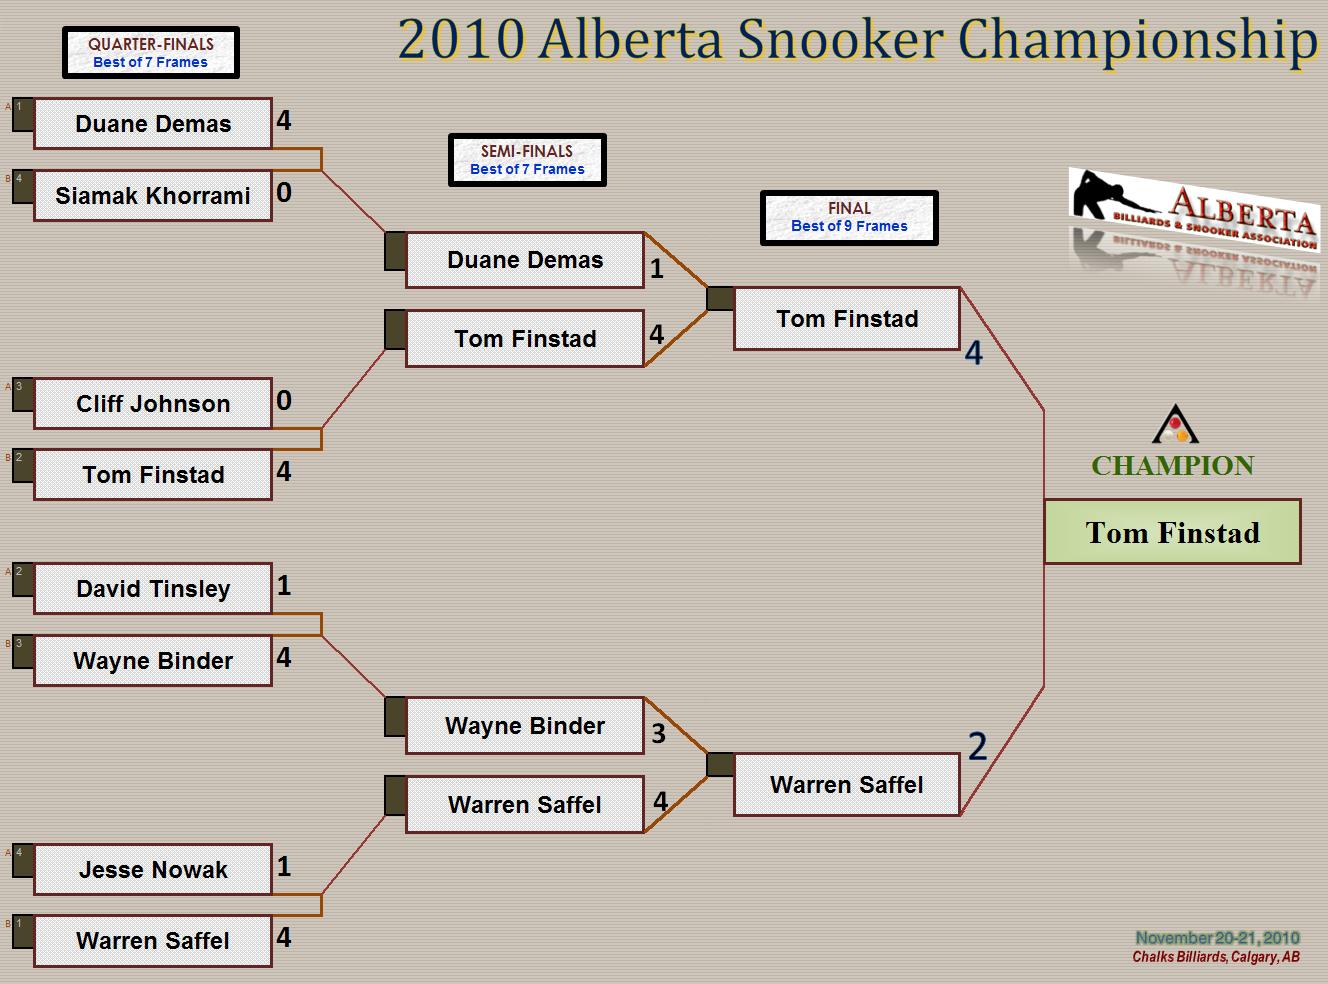 2010 Alberta Snooker Championship - Knockout